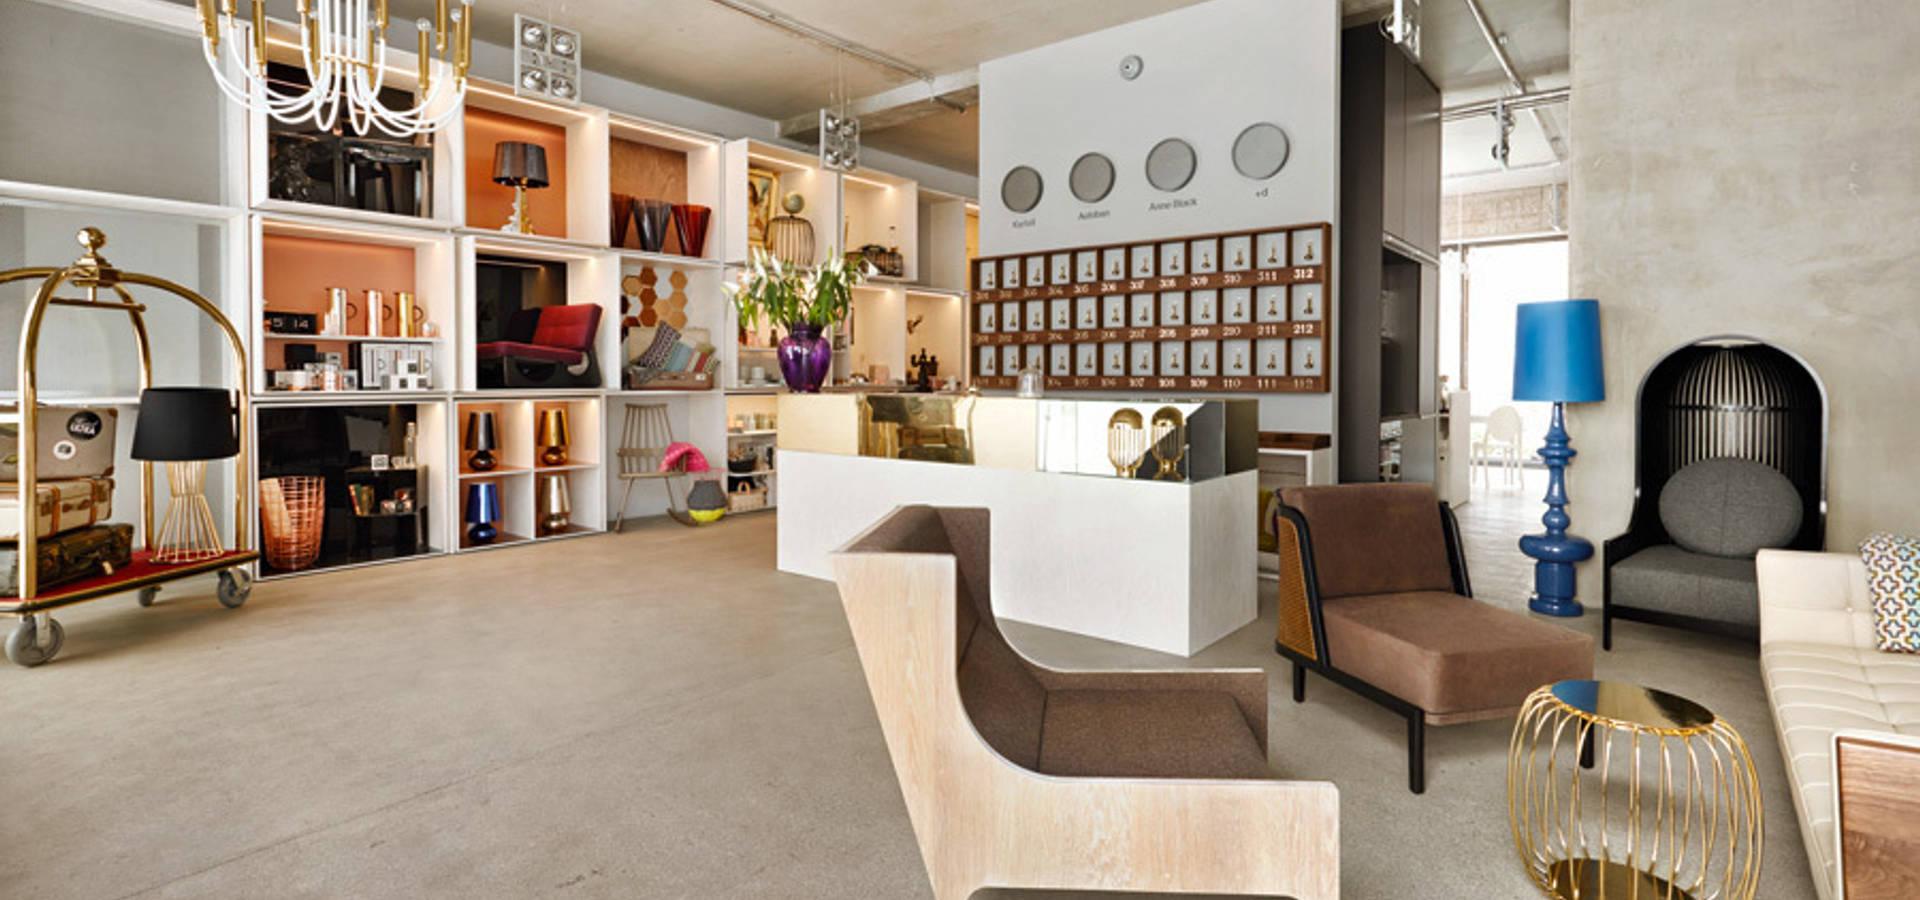 Hotel ULTRA Concept Store